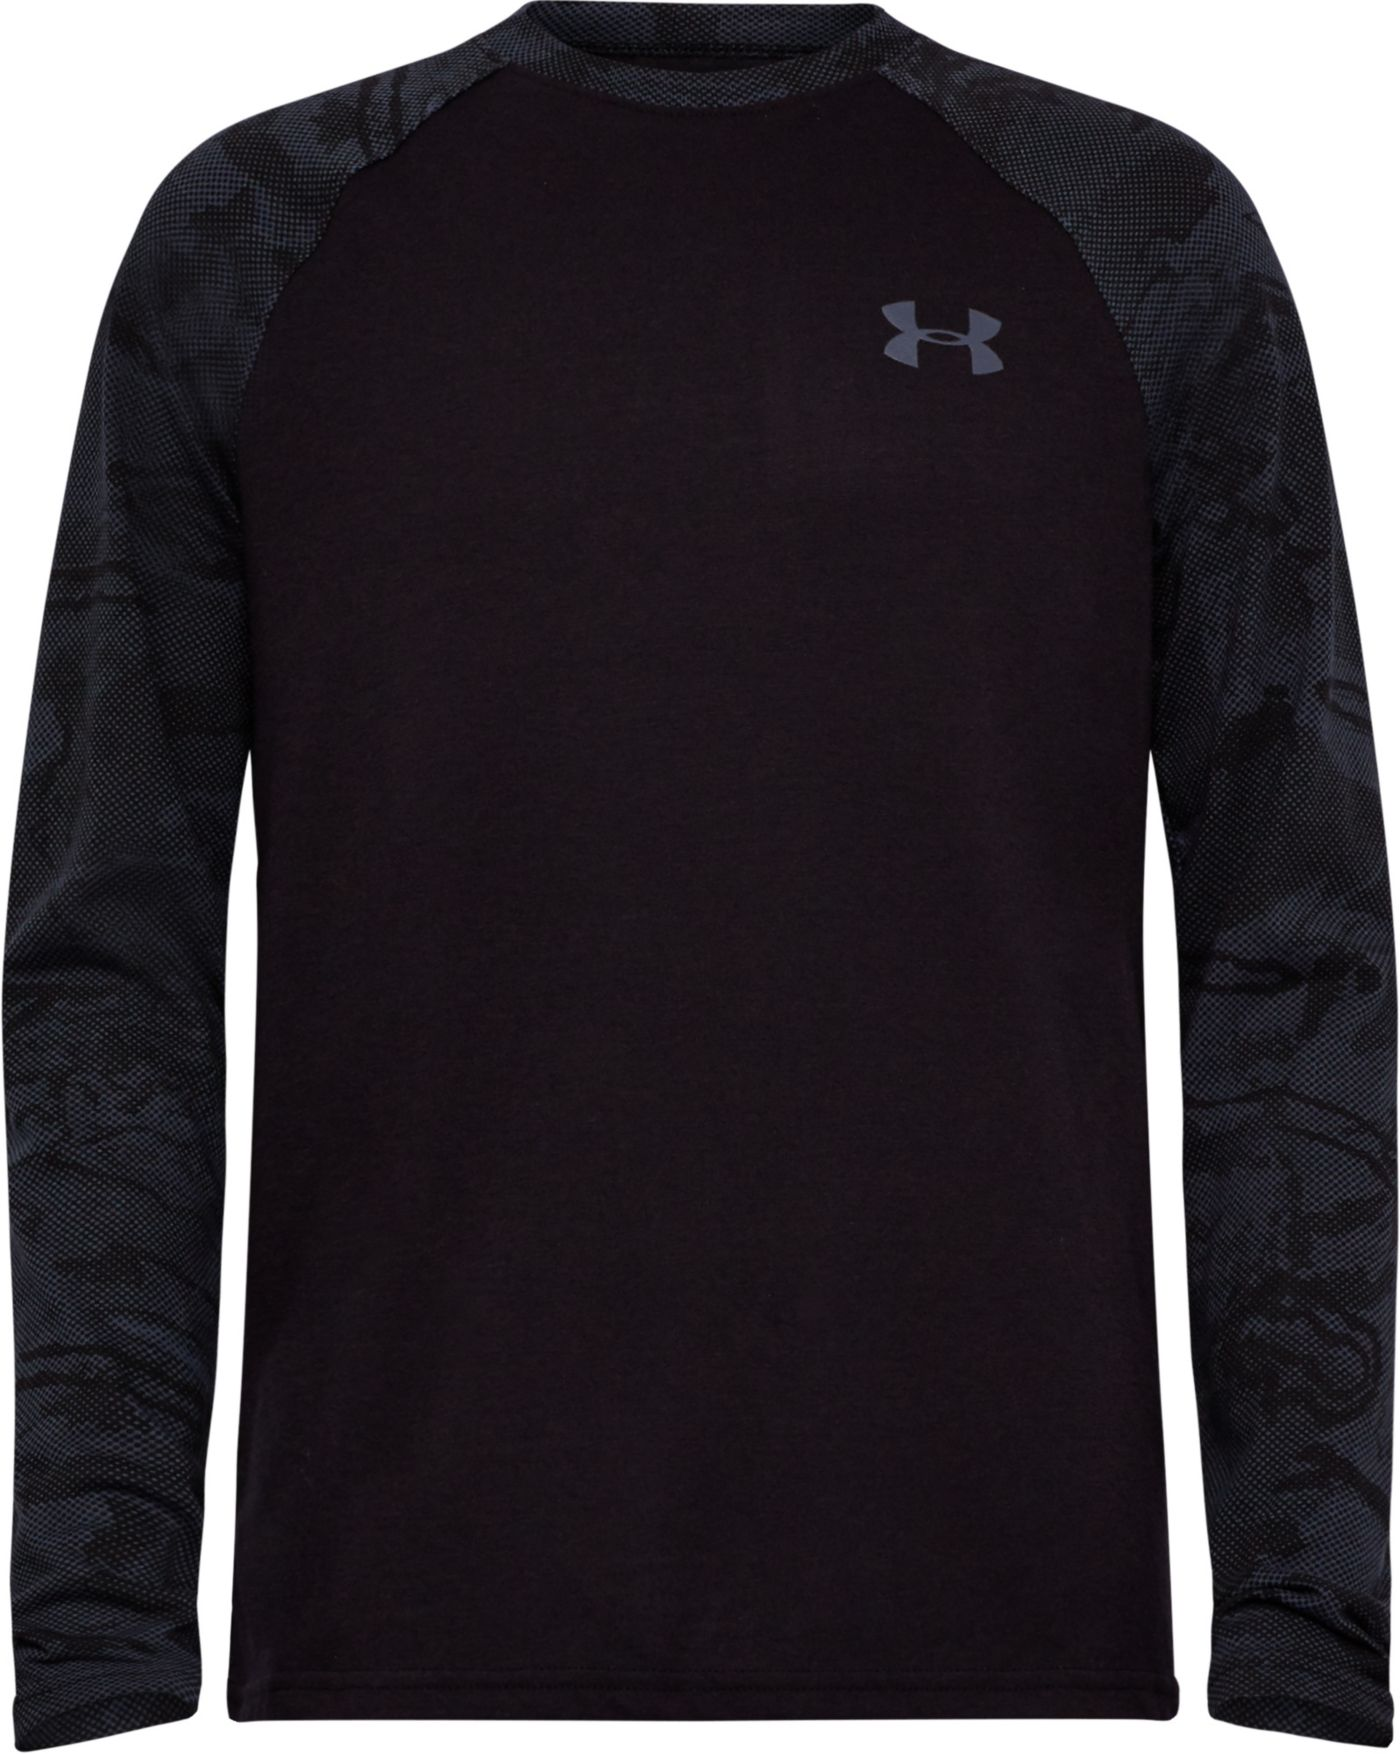 Under Armour Boys' Halftone Raglan Long Sleeve T-Shirt